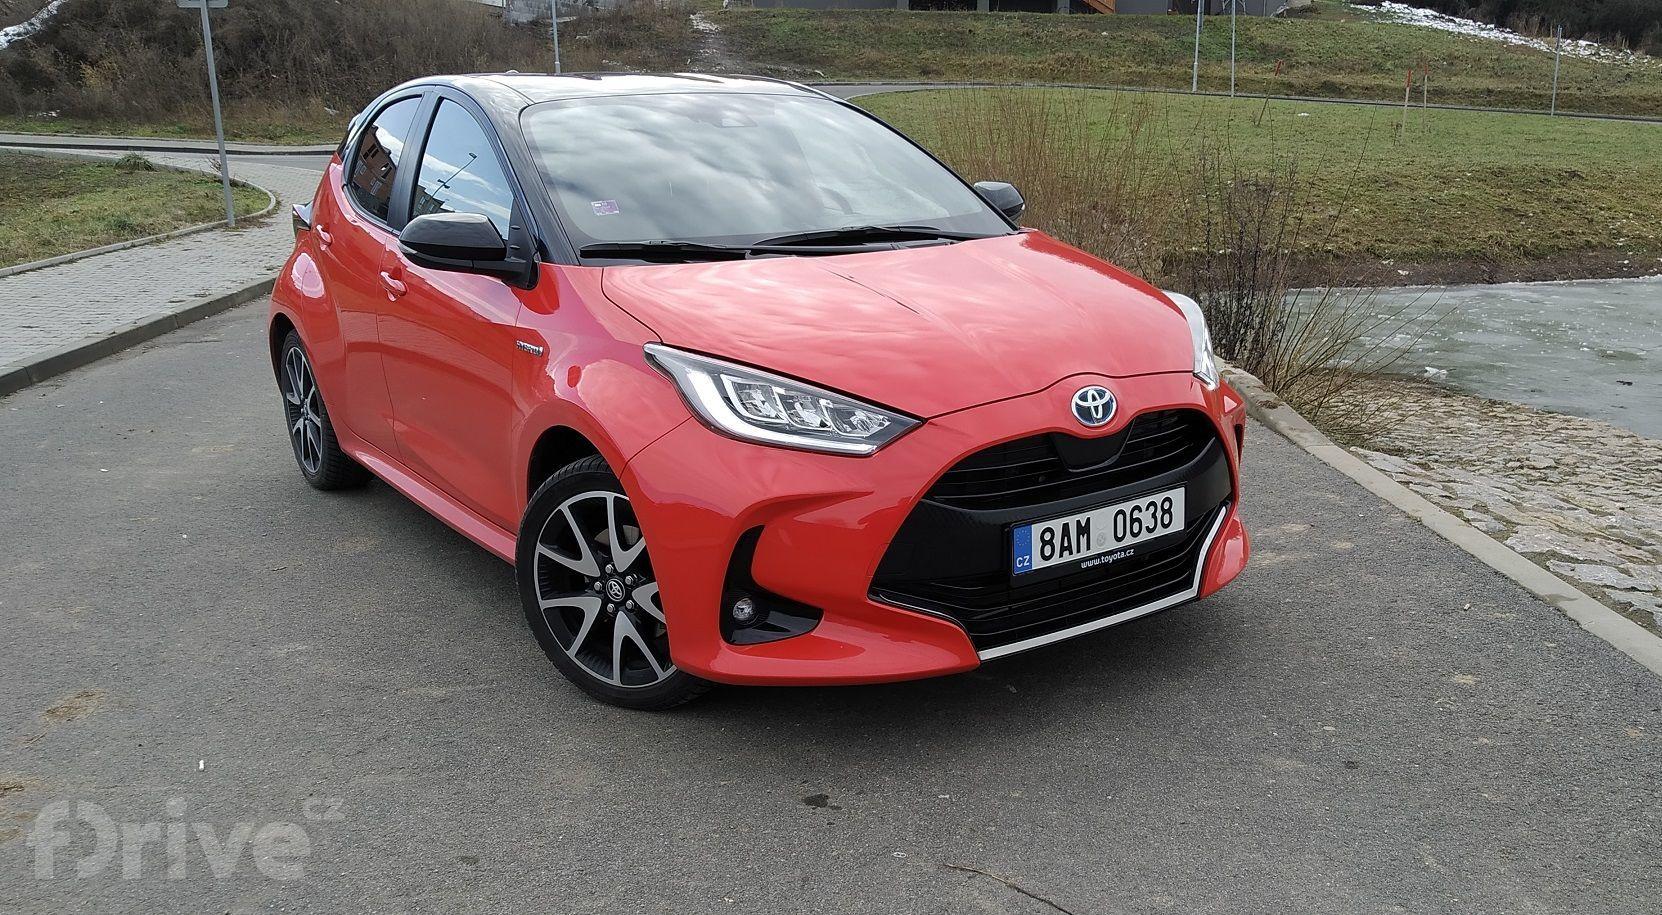 Toyota Yaris 1.5 Hybrid (2020)